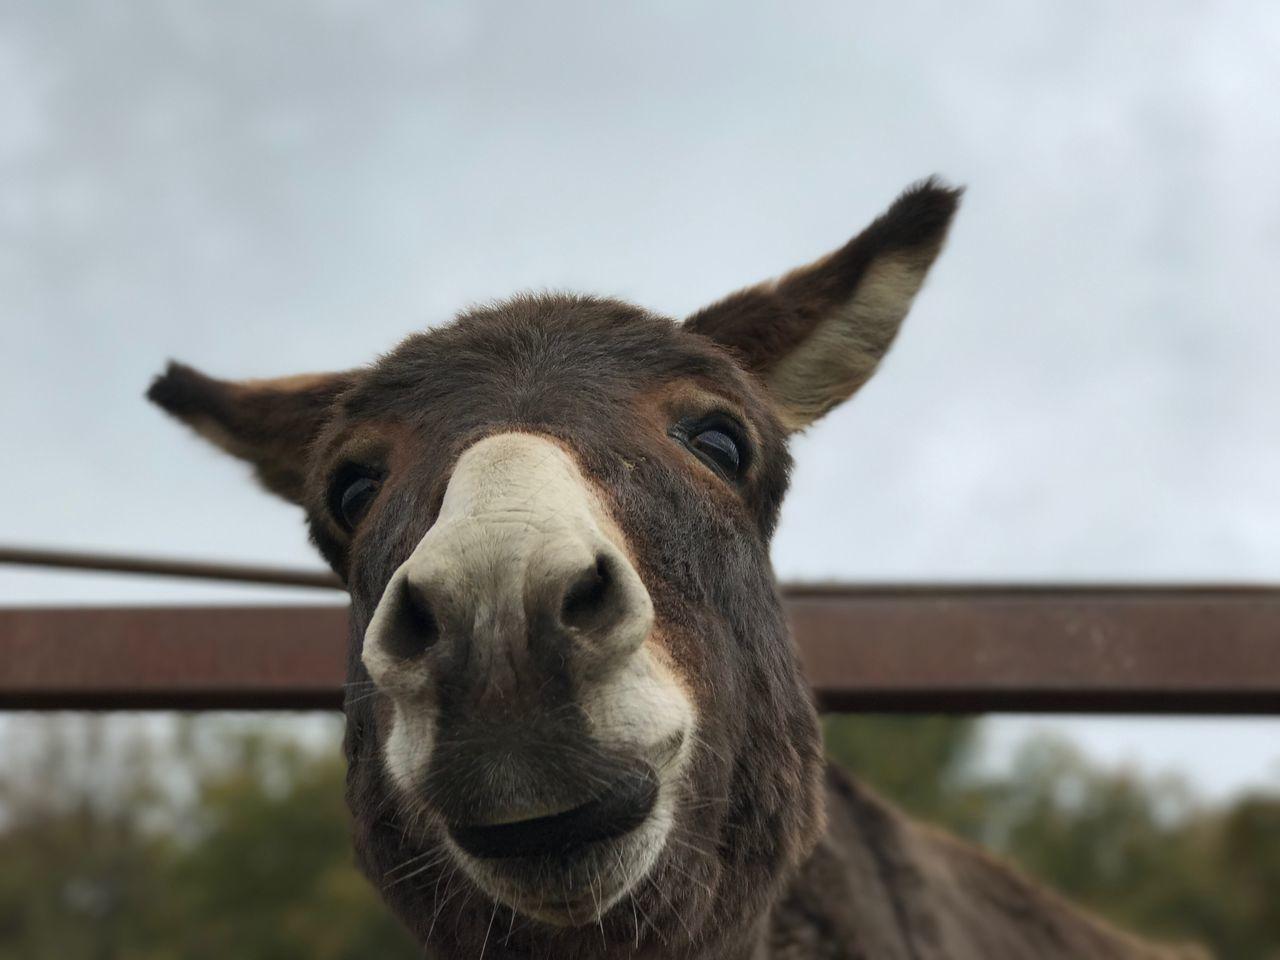 Stoparde Donkey Tivoli Asino Animal Themes One Animal Mammal Focus On Foreground Domestic Animals Livestock Looking At Camera